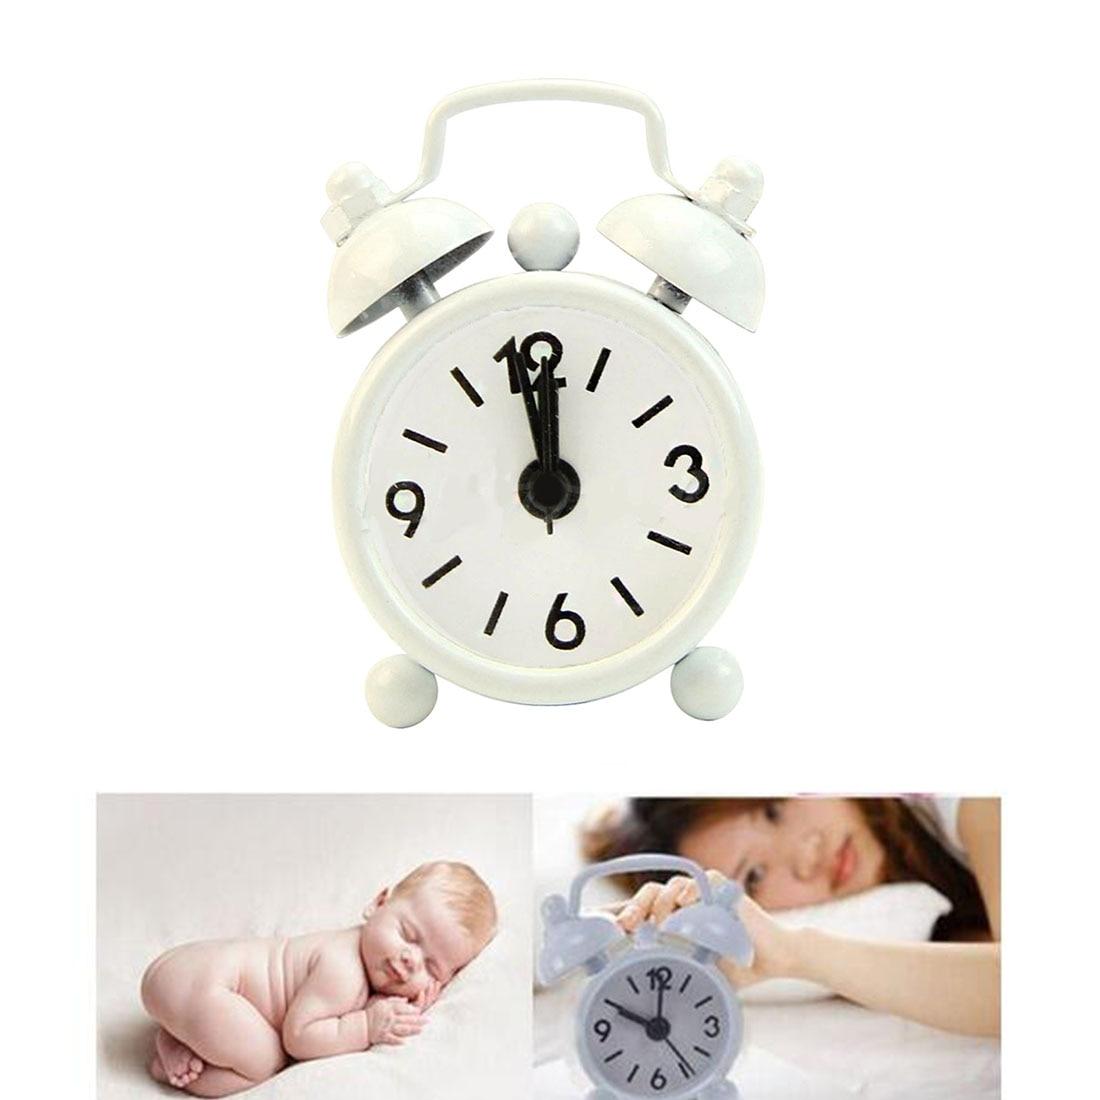 Home Decor Portable Cute Cartoon Classic Kids Children Bedroom Alarm Clock Round Number Double Bell Desk Table Digital Clock Home Decor Home & Garden